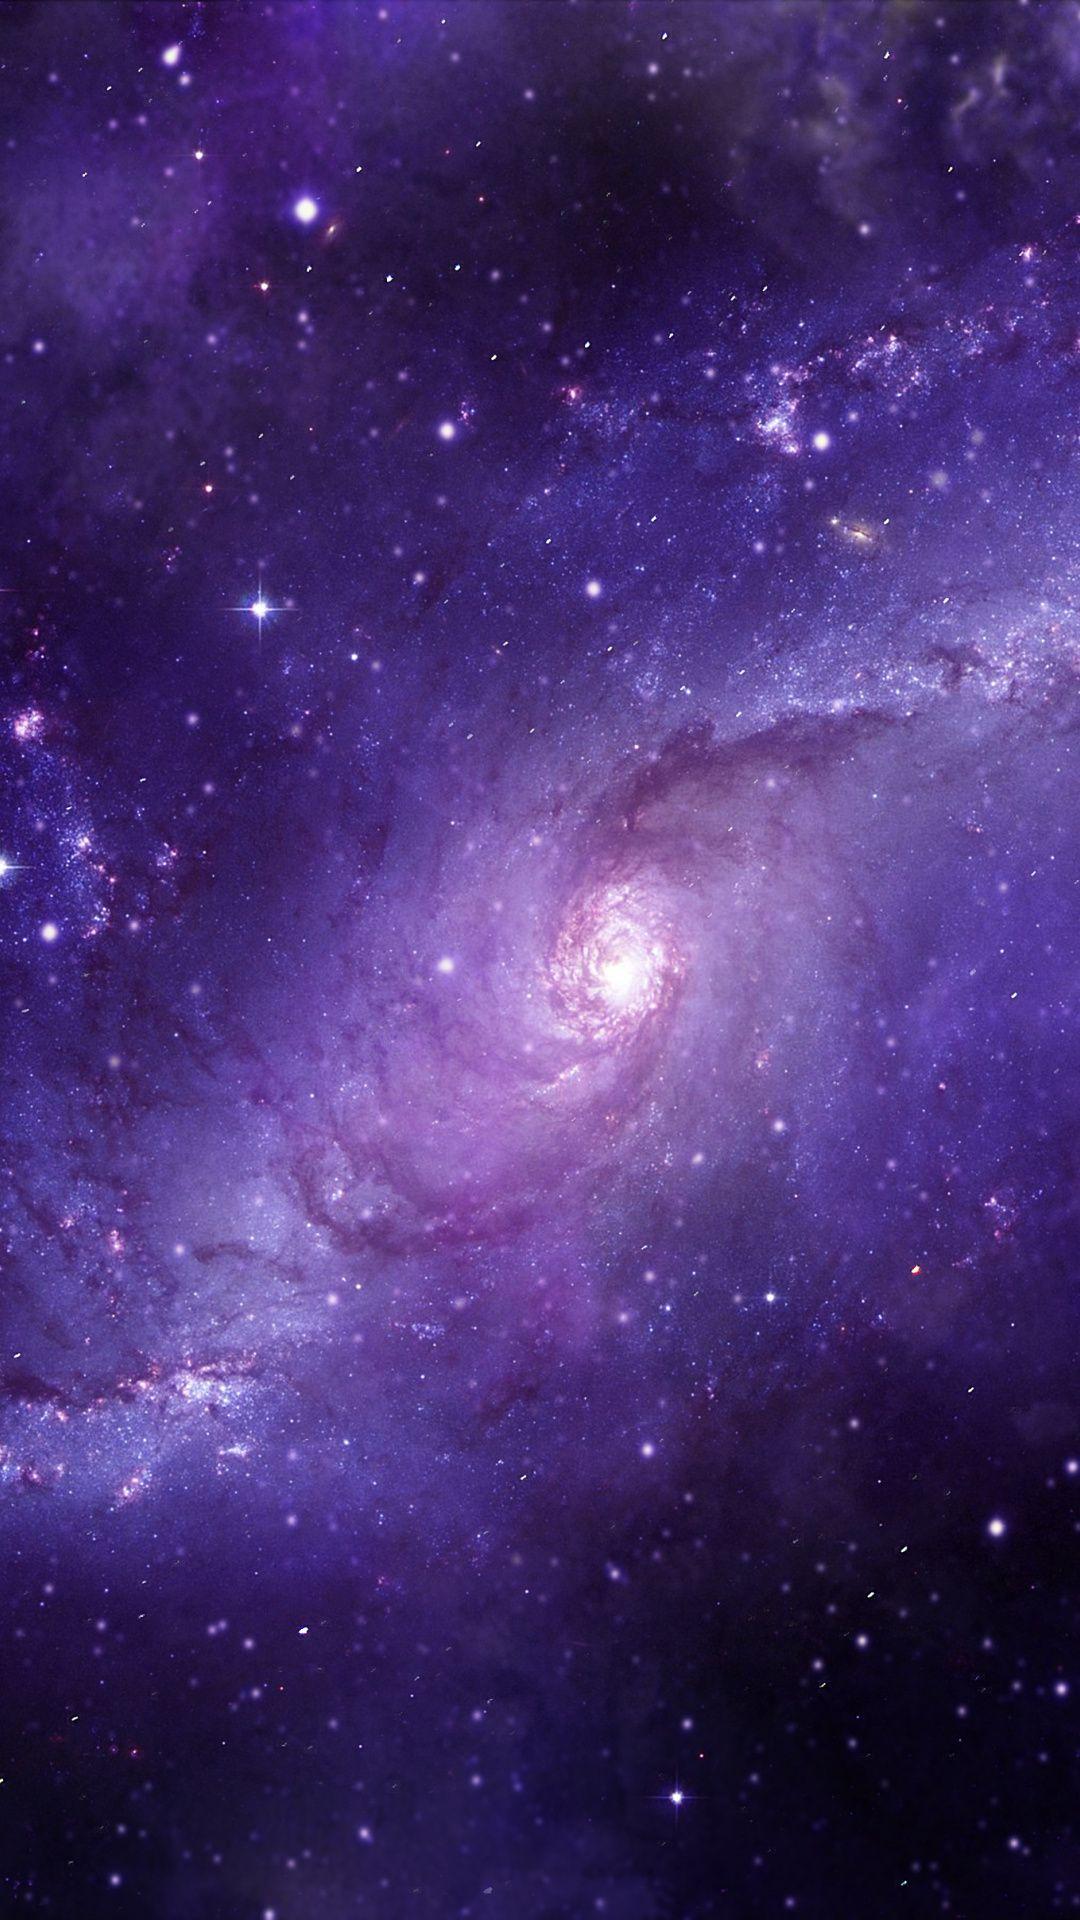 Spiral Galaxy Fantasy Space Uzay Boslugu Galaksiler Gece Gokyuzu Goruntuleri